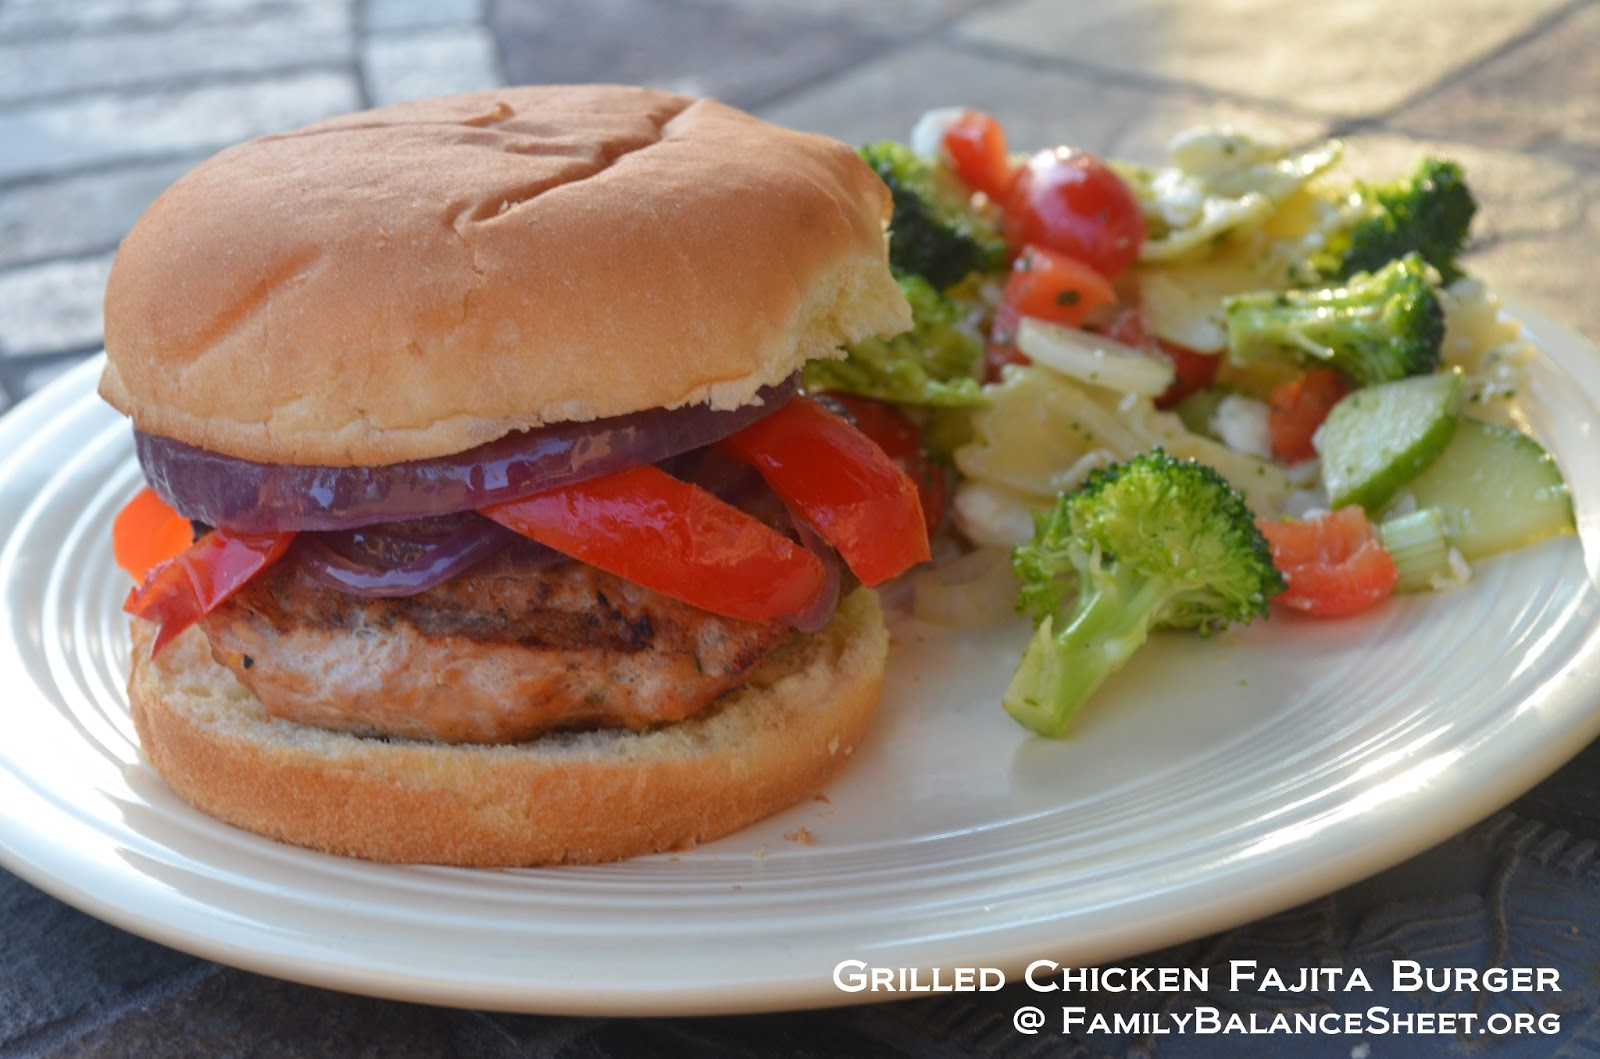 Grilled Chicken Fajita Burgers